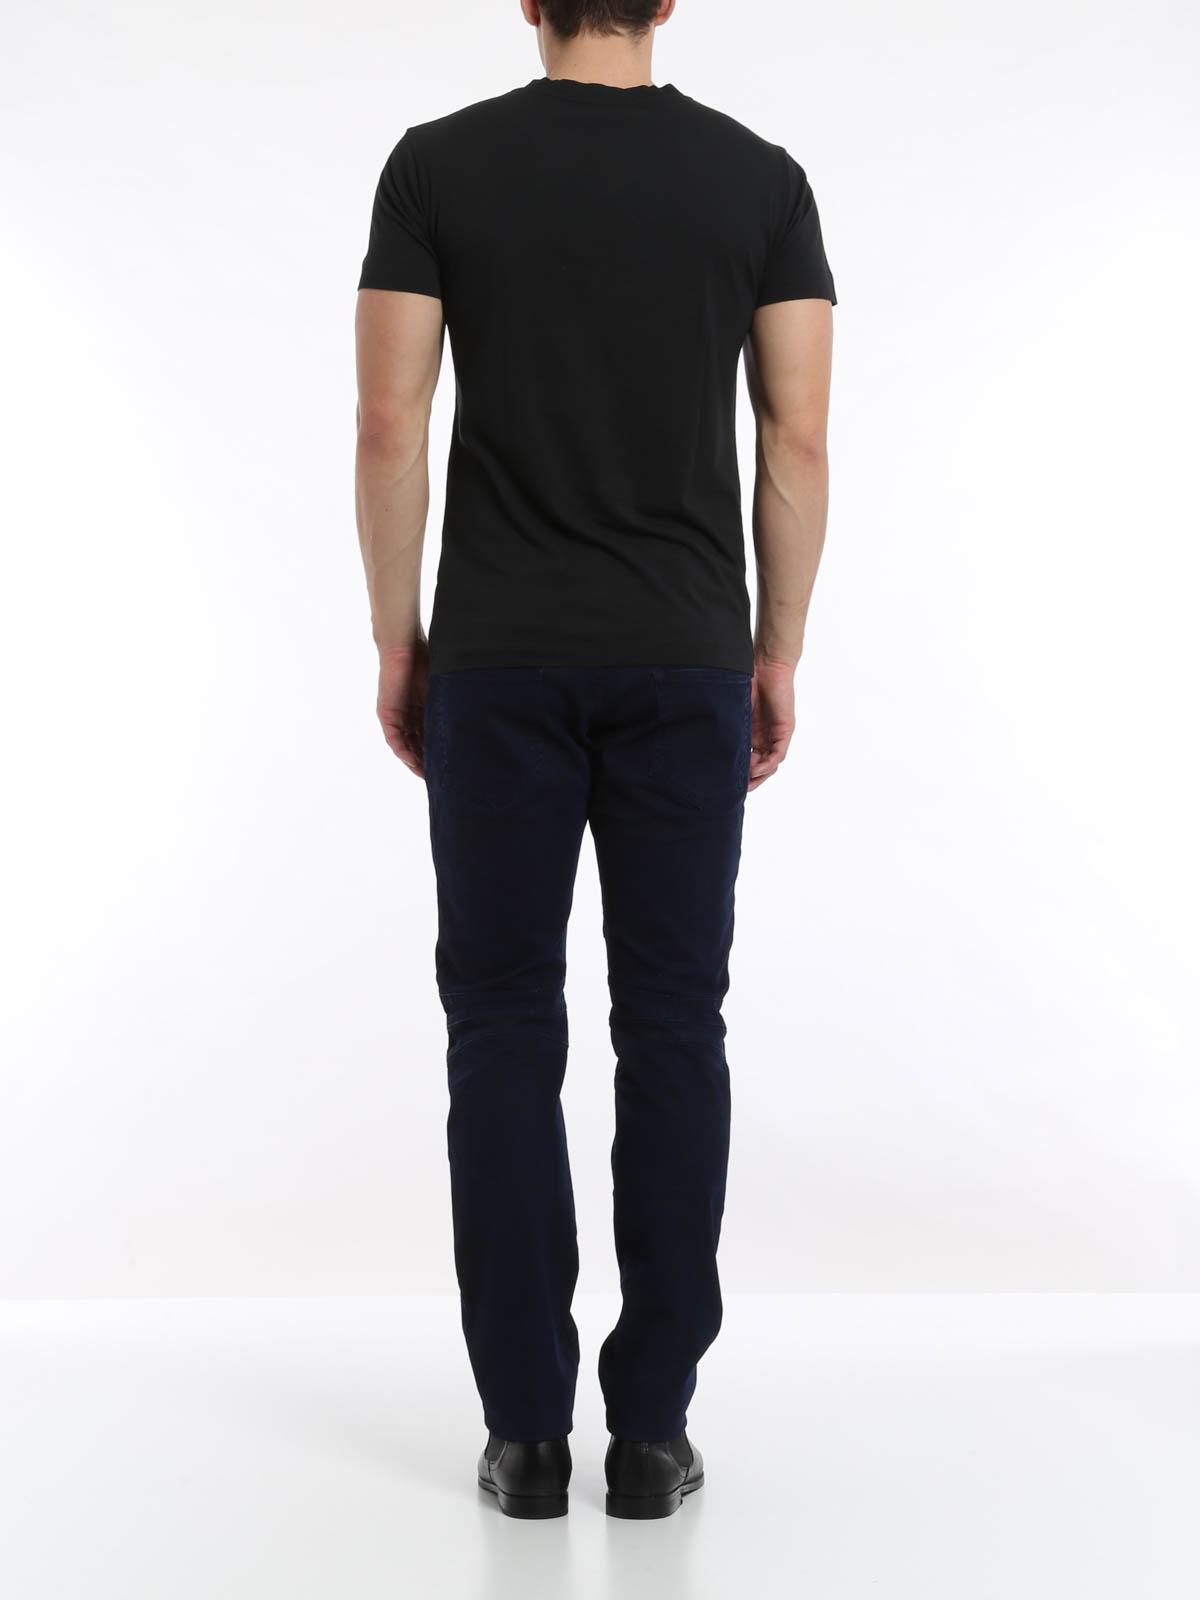 V neck good fashion t shirt by pierre balmain t shirts for V neck t shirt online shopping